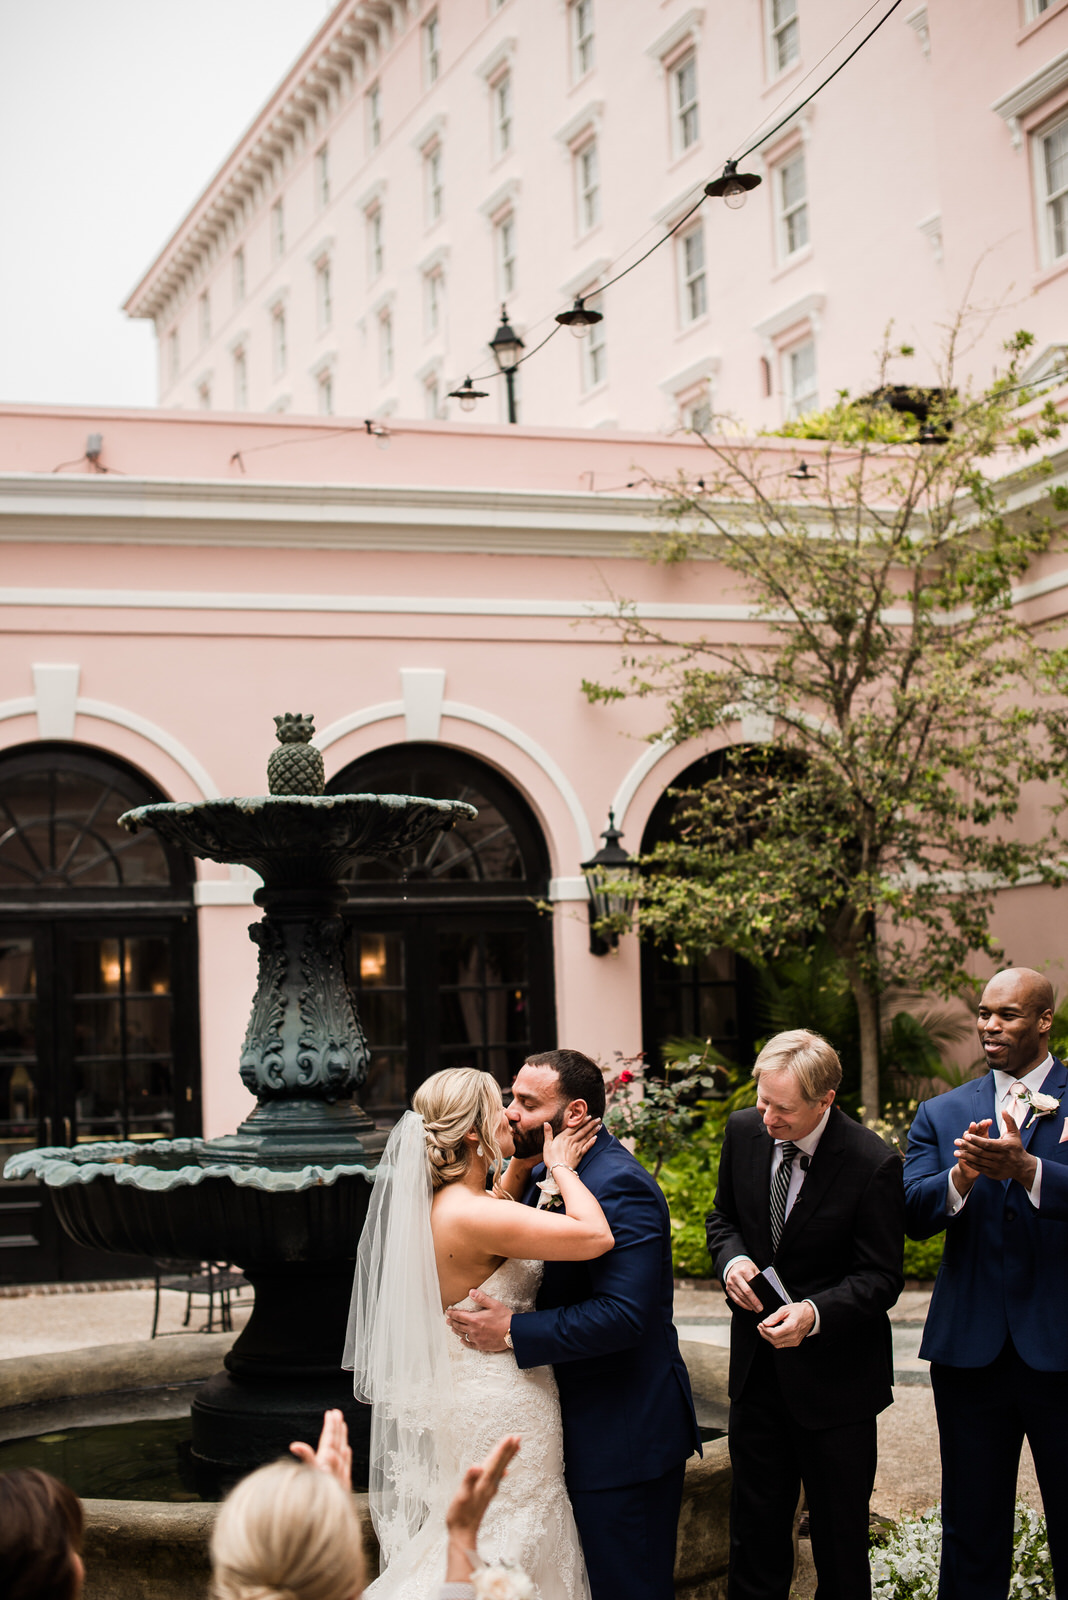 a romantic garden wedding - MILLS HOUSE HOTEL | CHARLESTON, SC